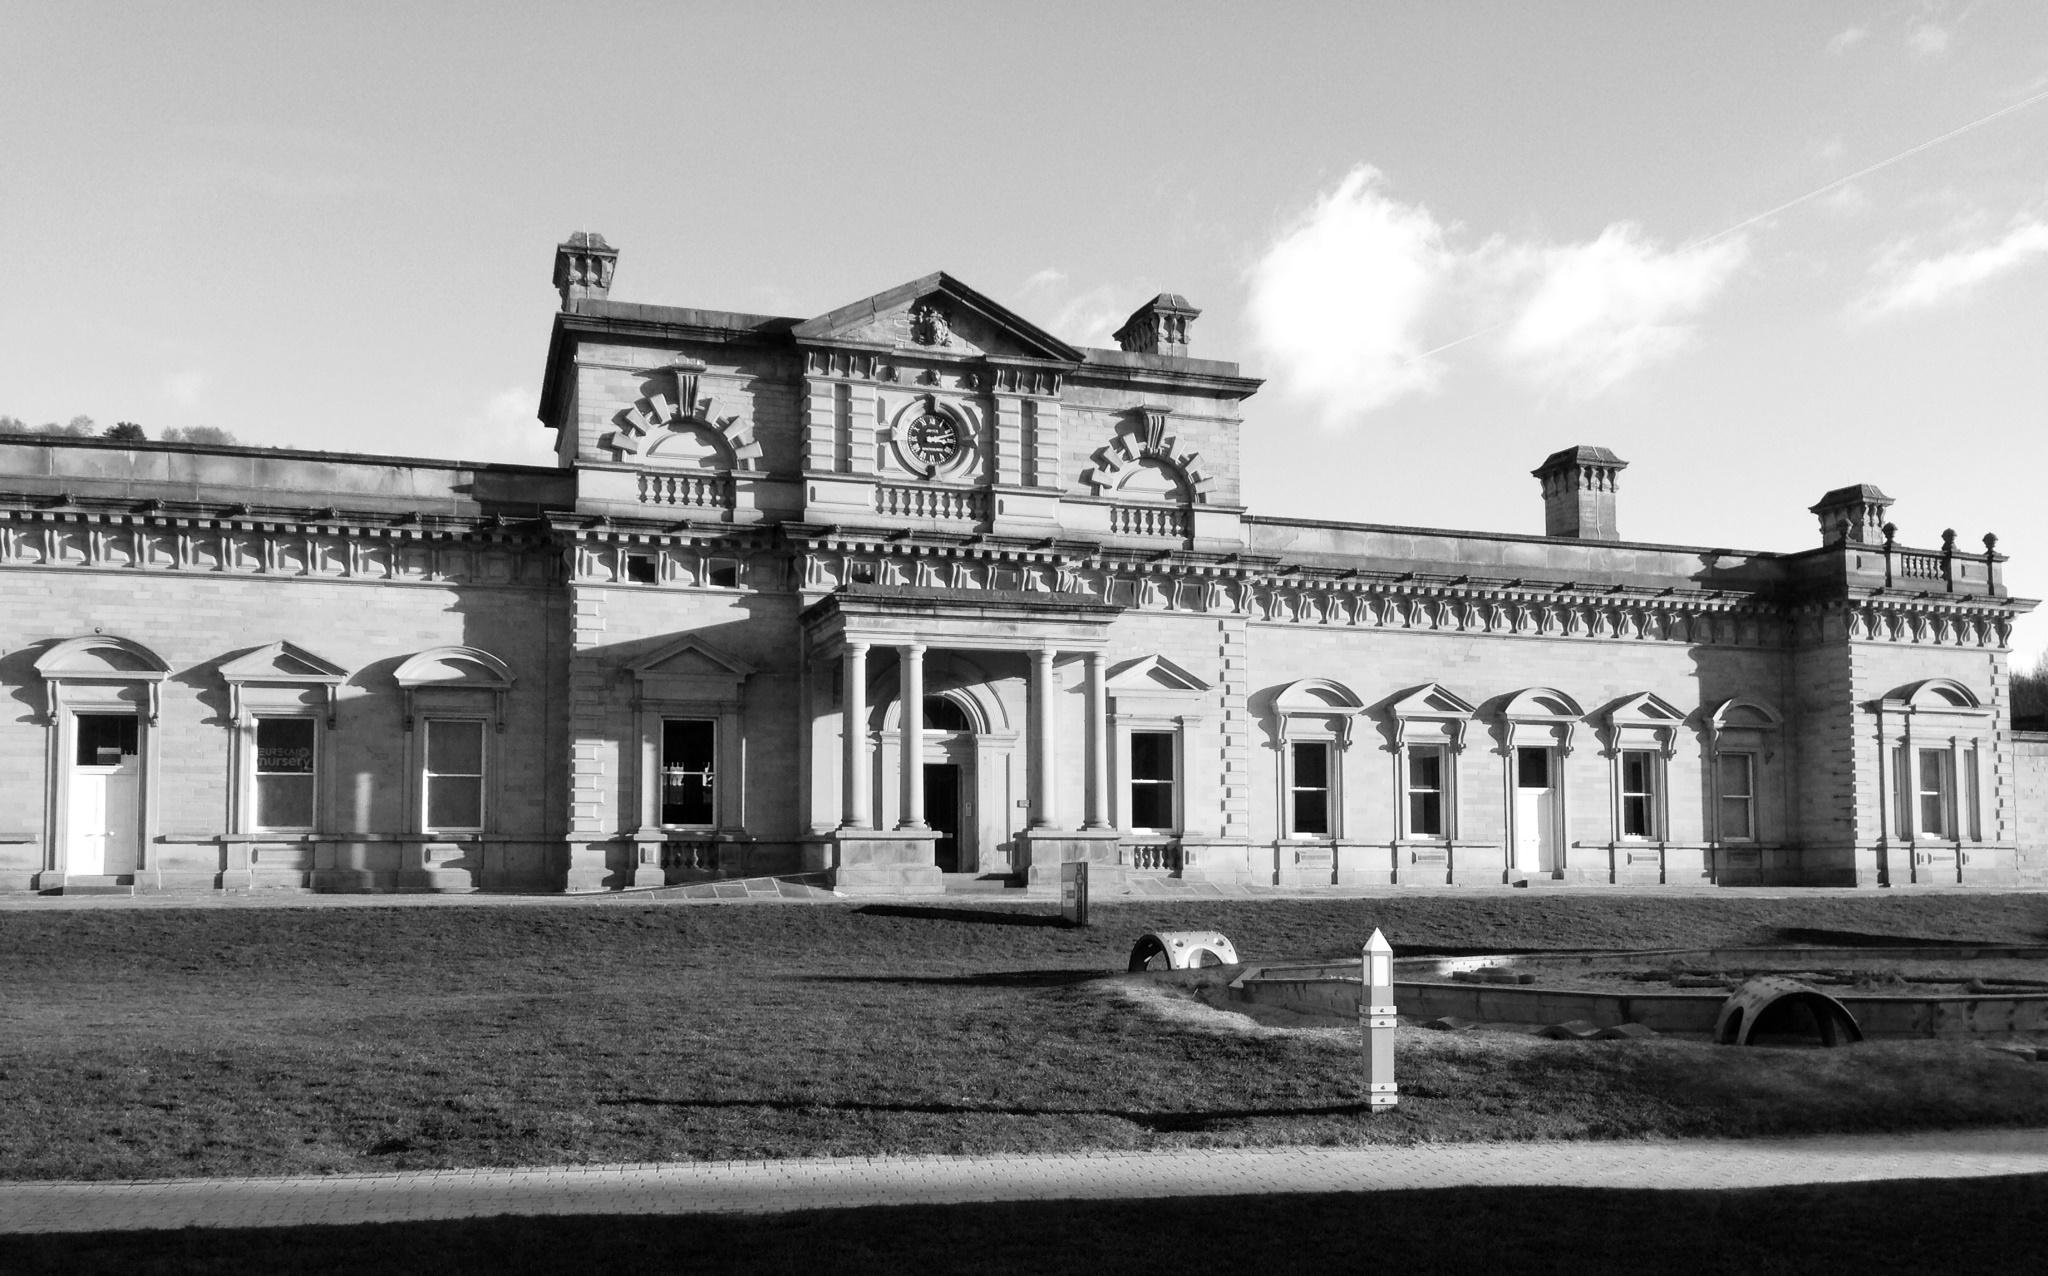 Halifax Railway Station (Rail Tour 2015)